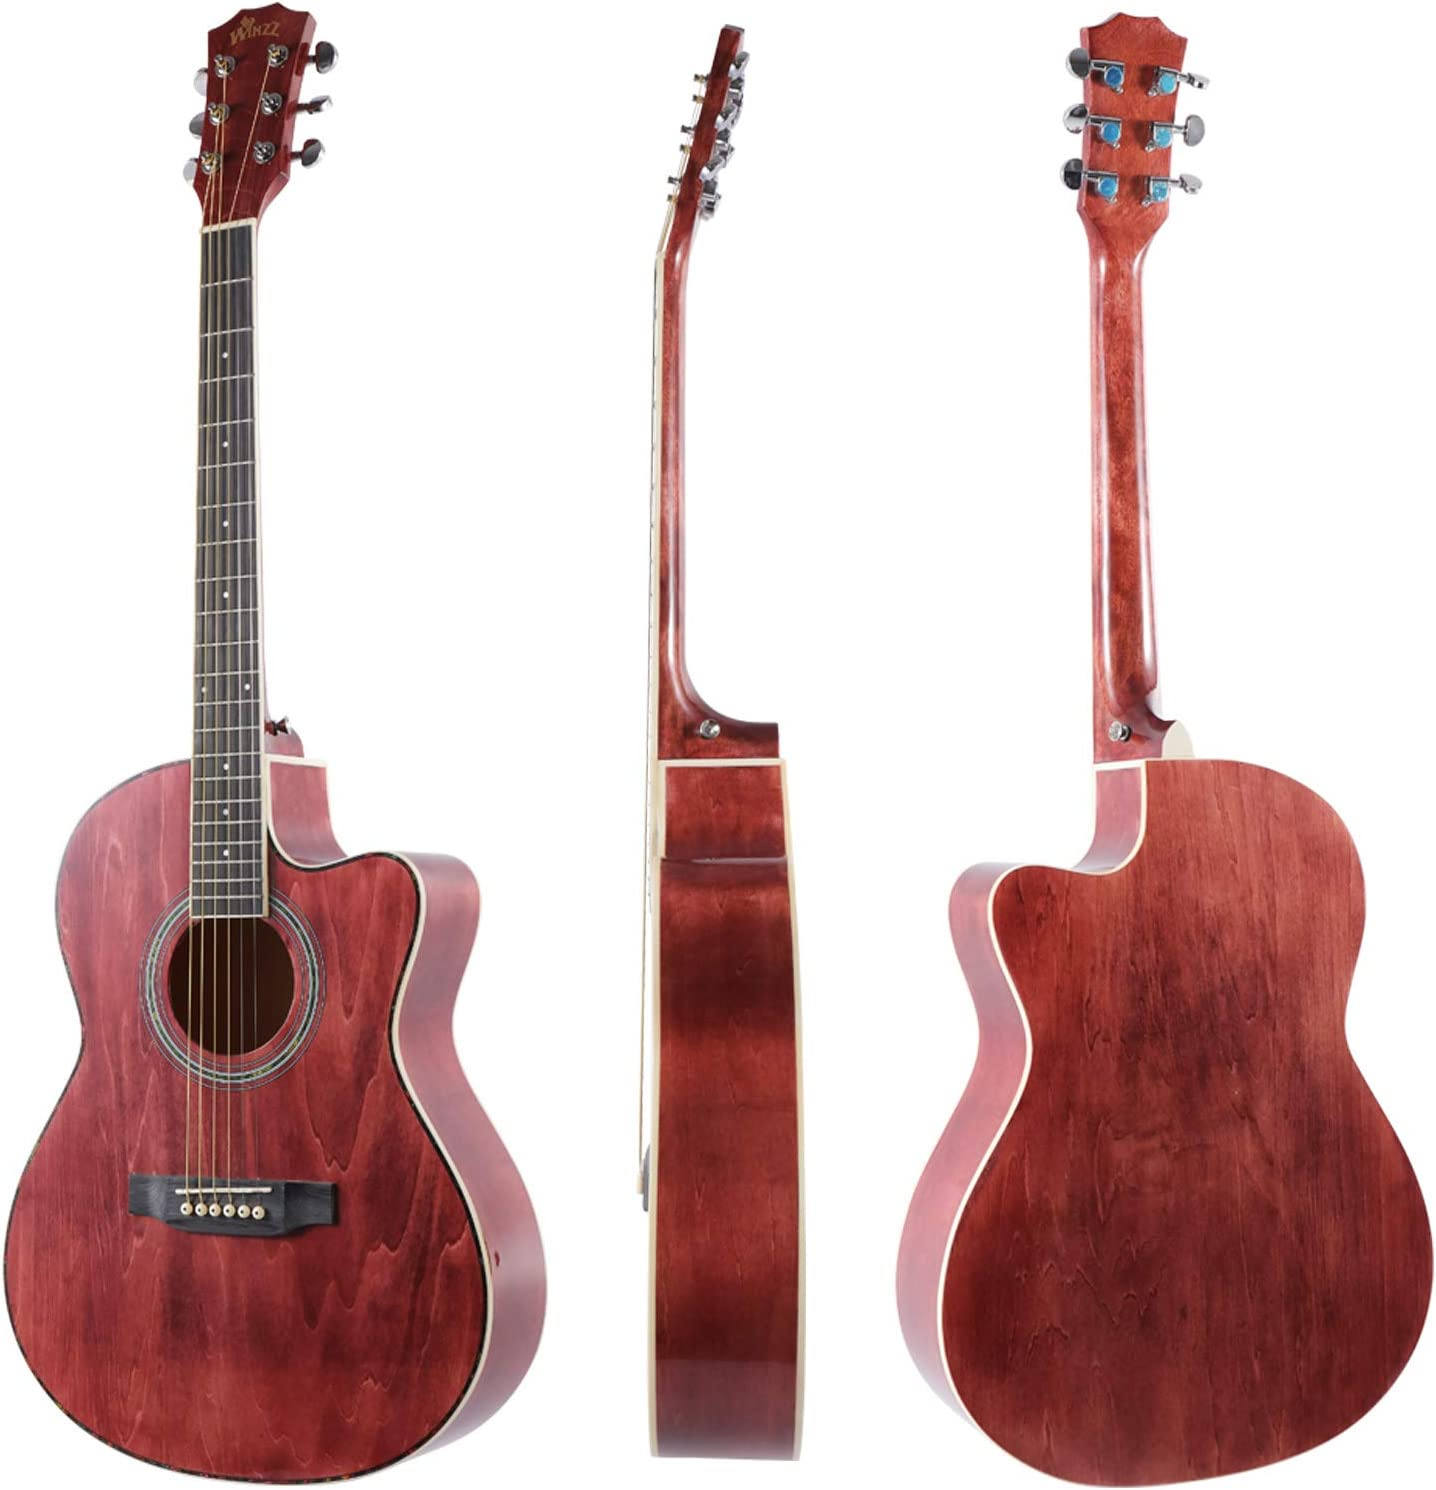 Tama/ño 3//4 Guitarra Ac/ústica Negro Kit para Principiantes Winzz Guitarra Folk para Ni/ños 36 Pulgadas